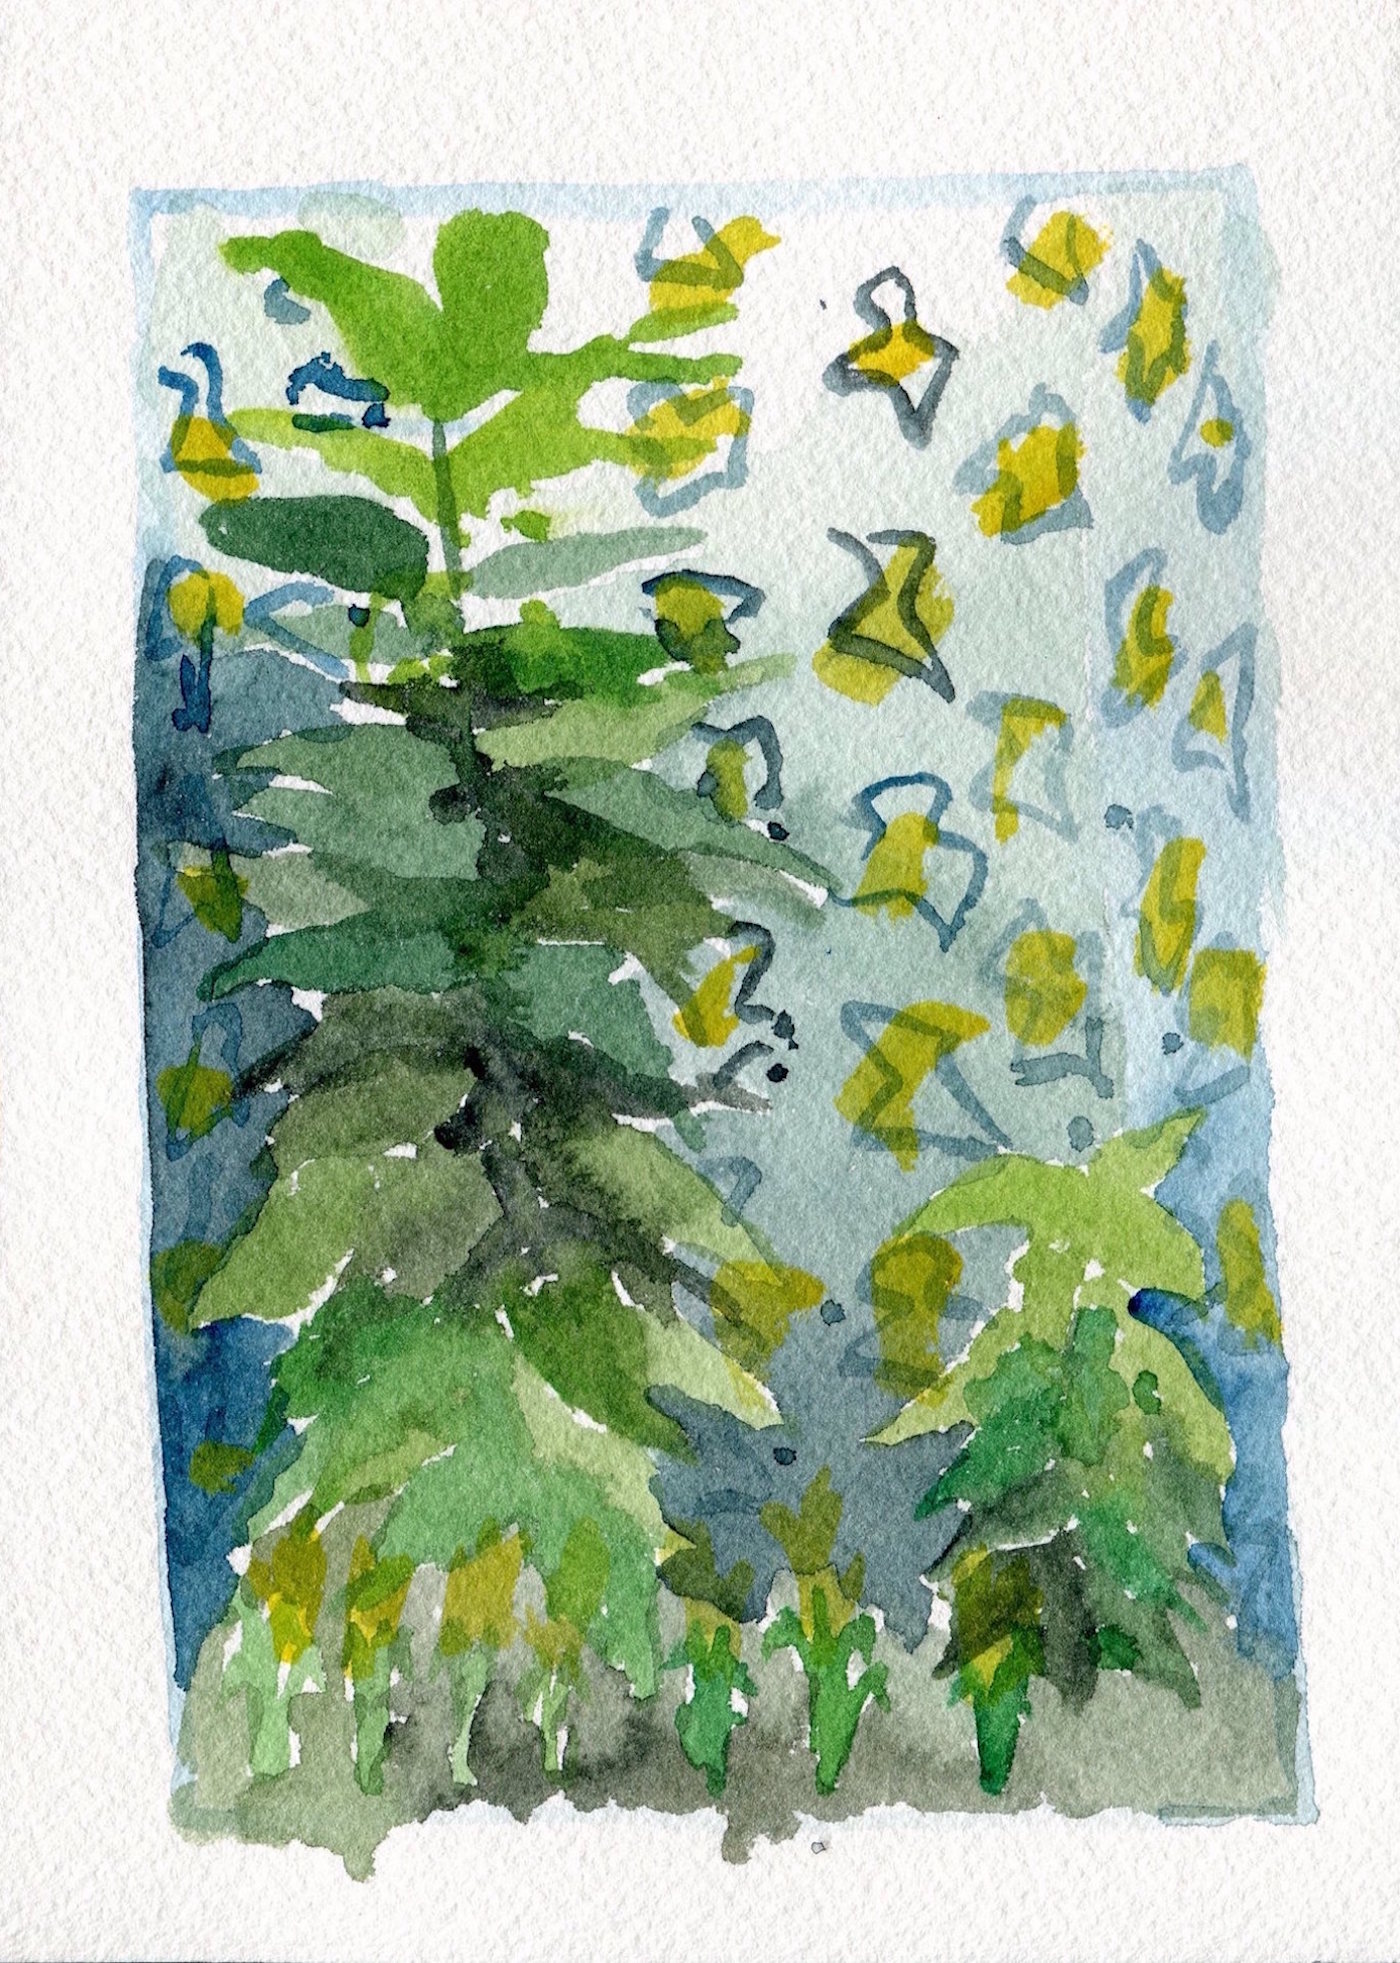 Burle Marx Watercolor2.0cu2t